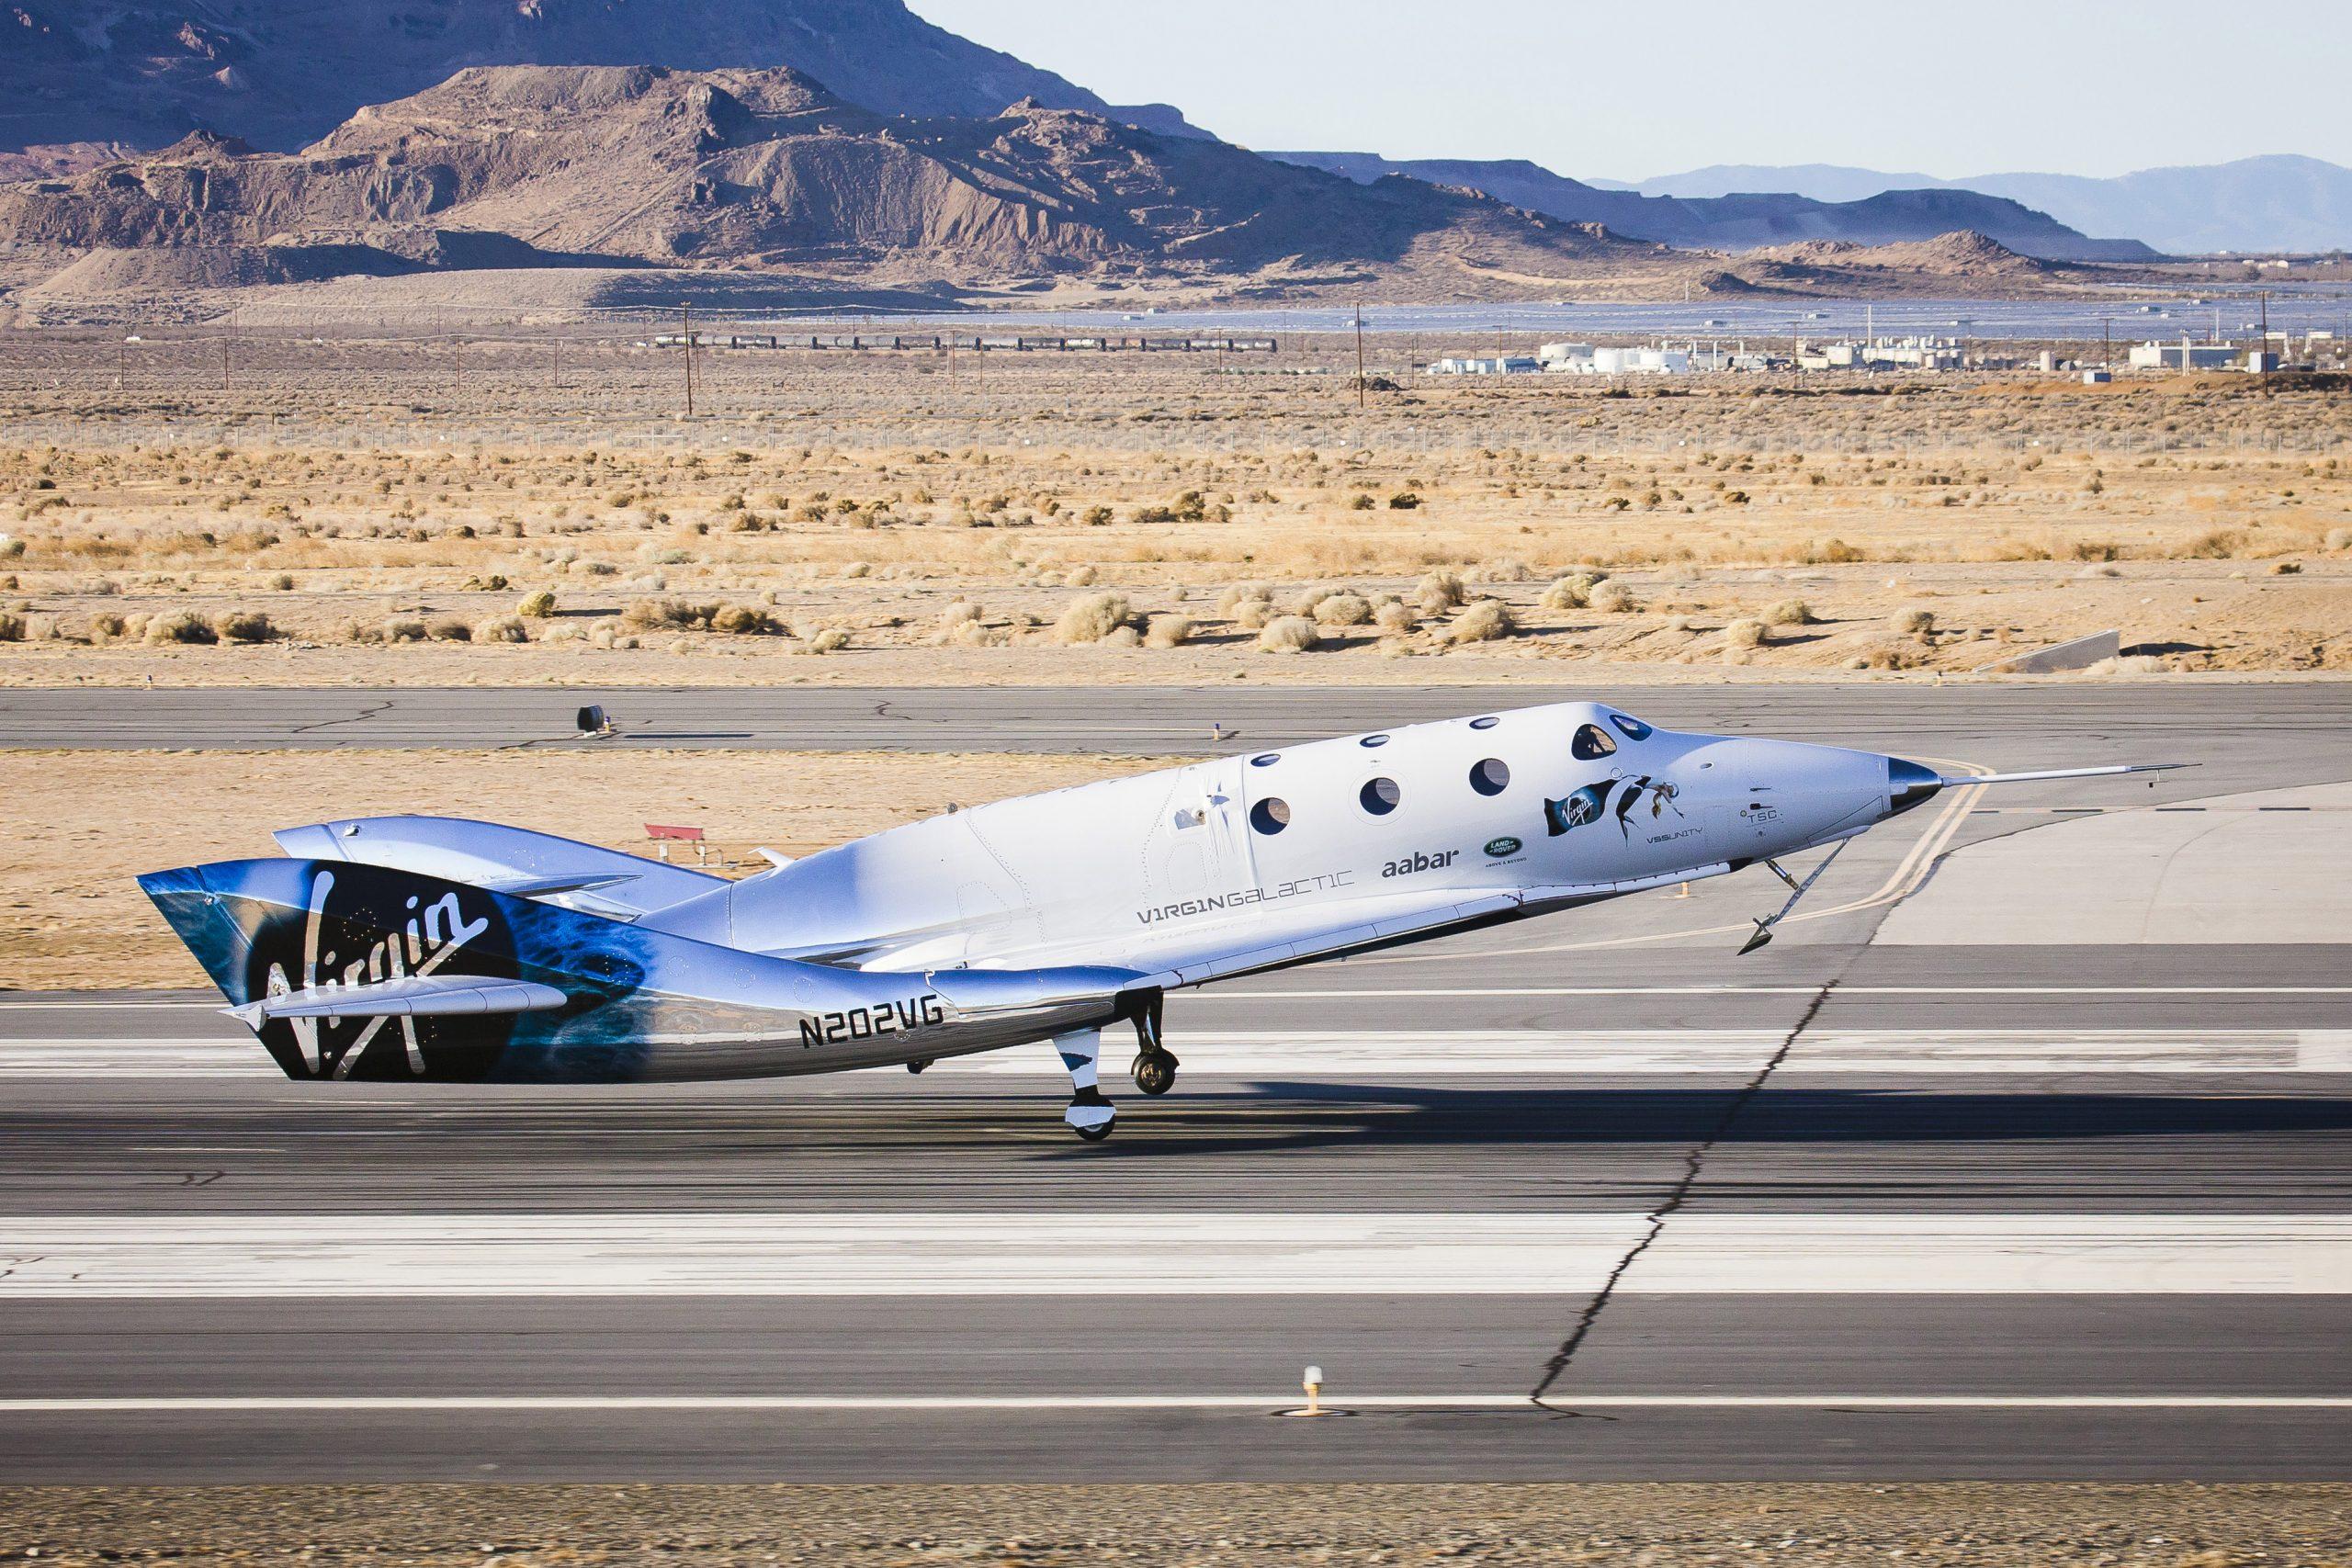 Rumfartøjet VSS Unity fra Virgin Galactic i en landing i Mojave-ørkenen i USA. Foto: Virgin Galactic